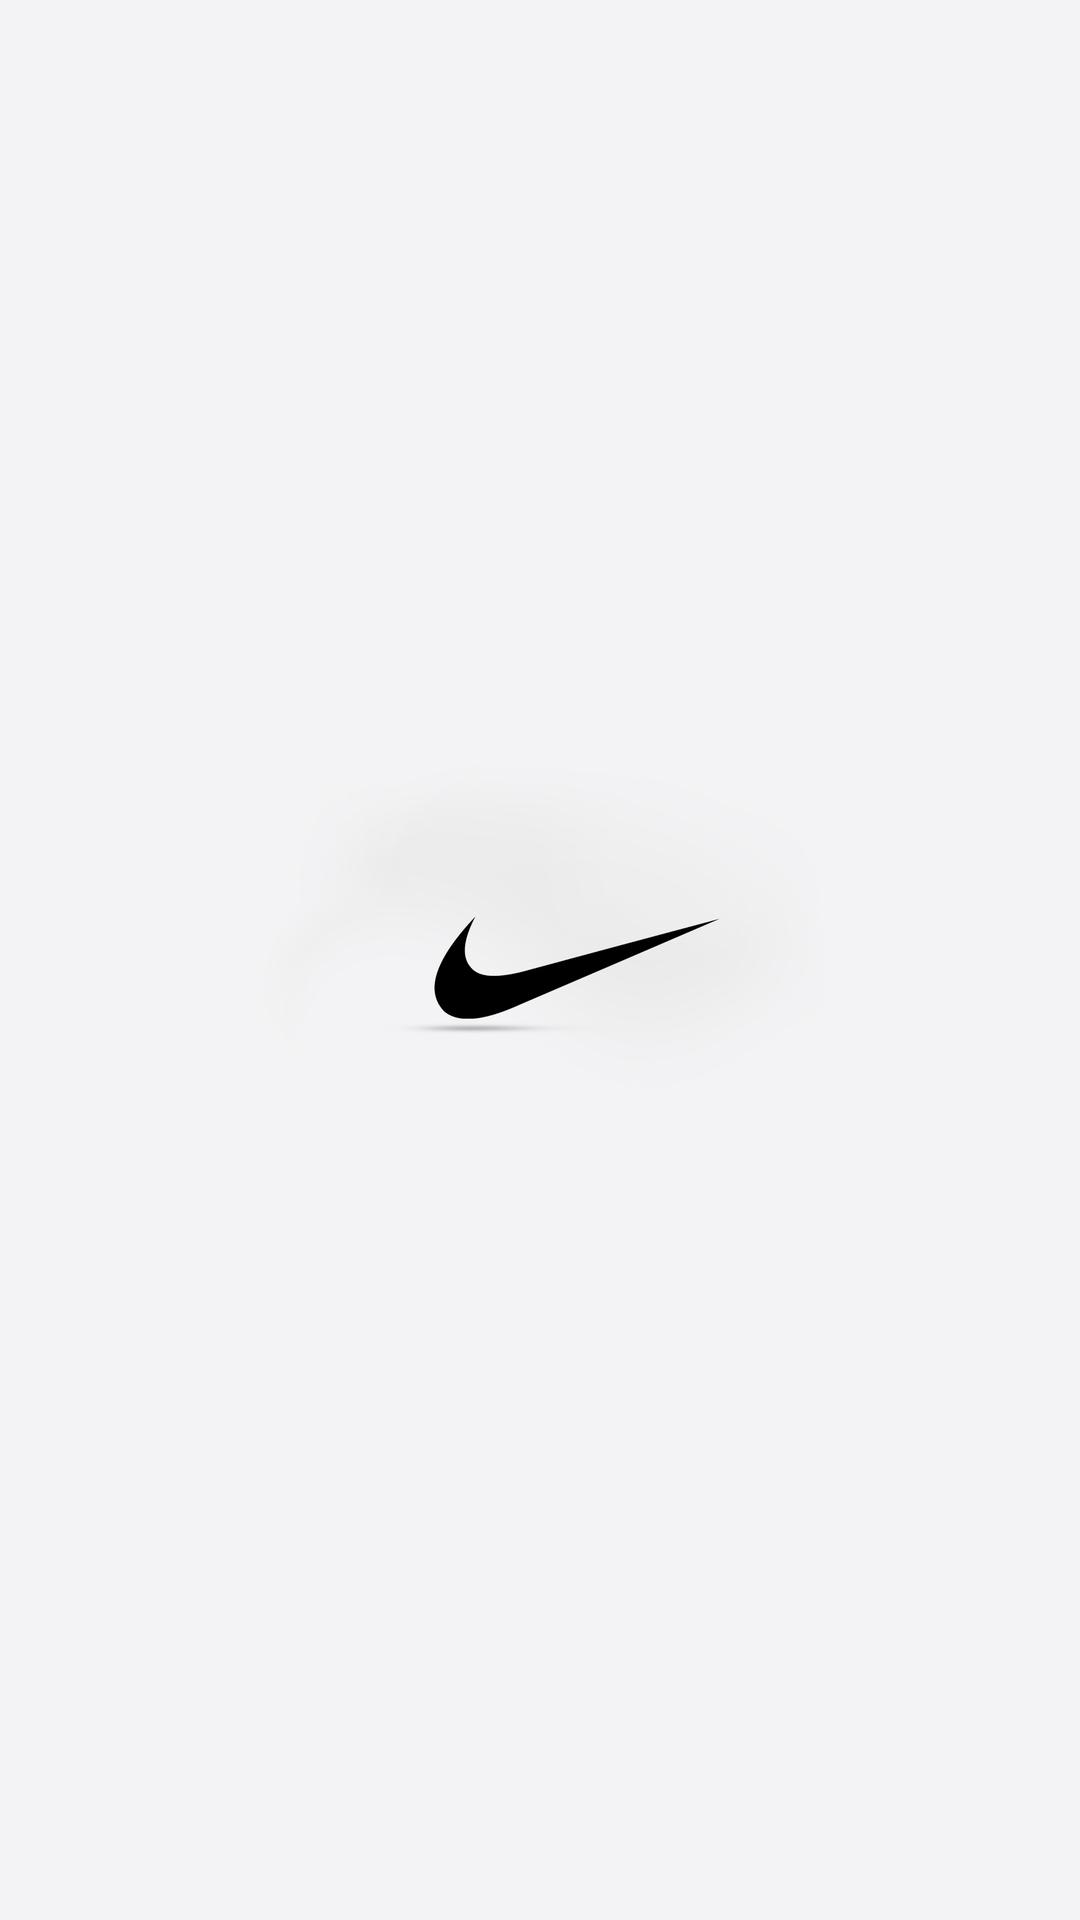 50 Iphone Nike Wallpaper Hd On Wallpapersafari